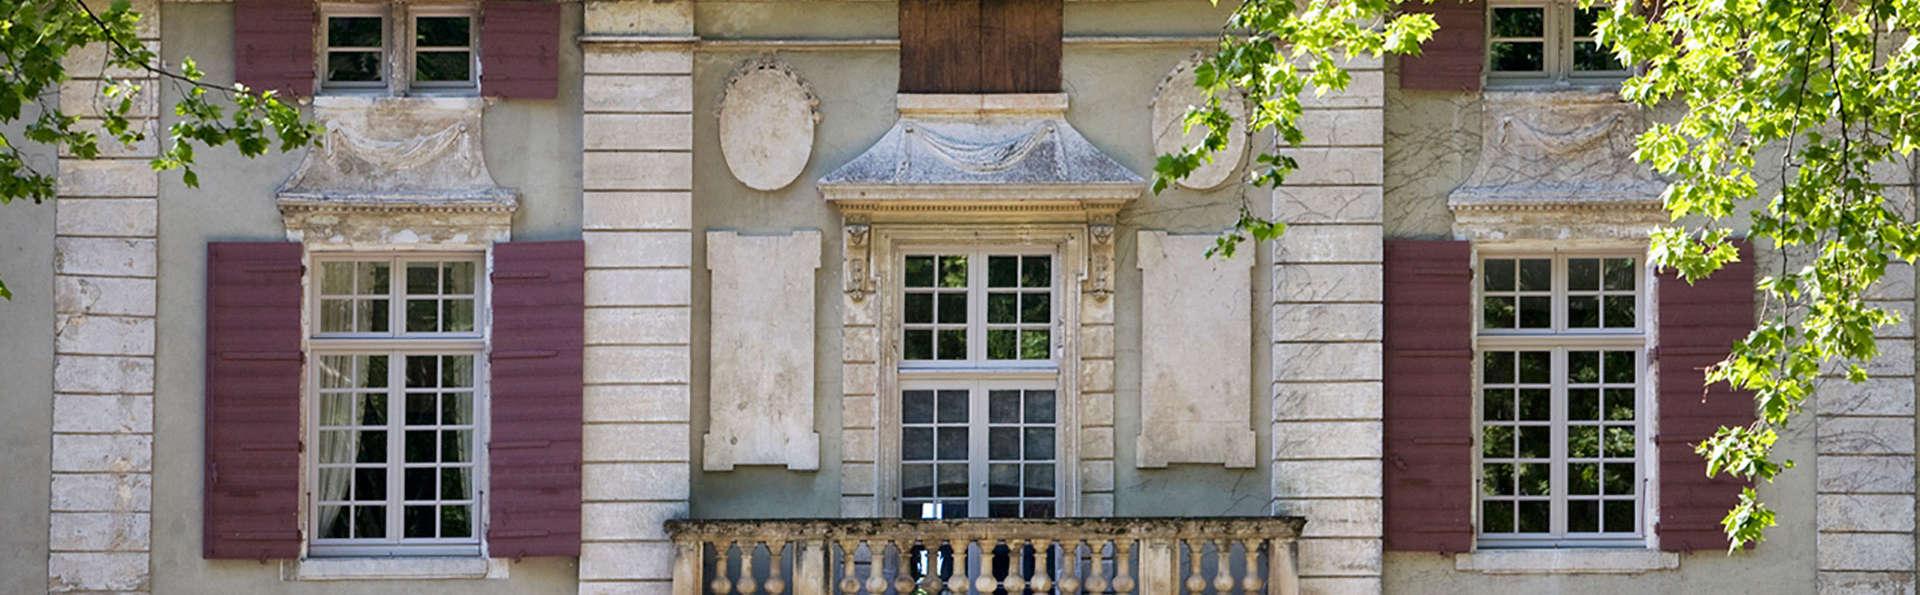 Château de Roussan - EDIT_facade.jpg